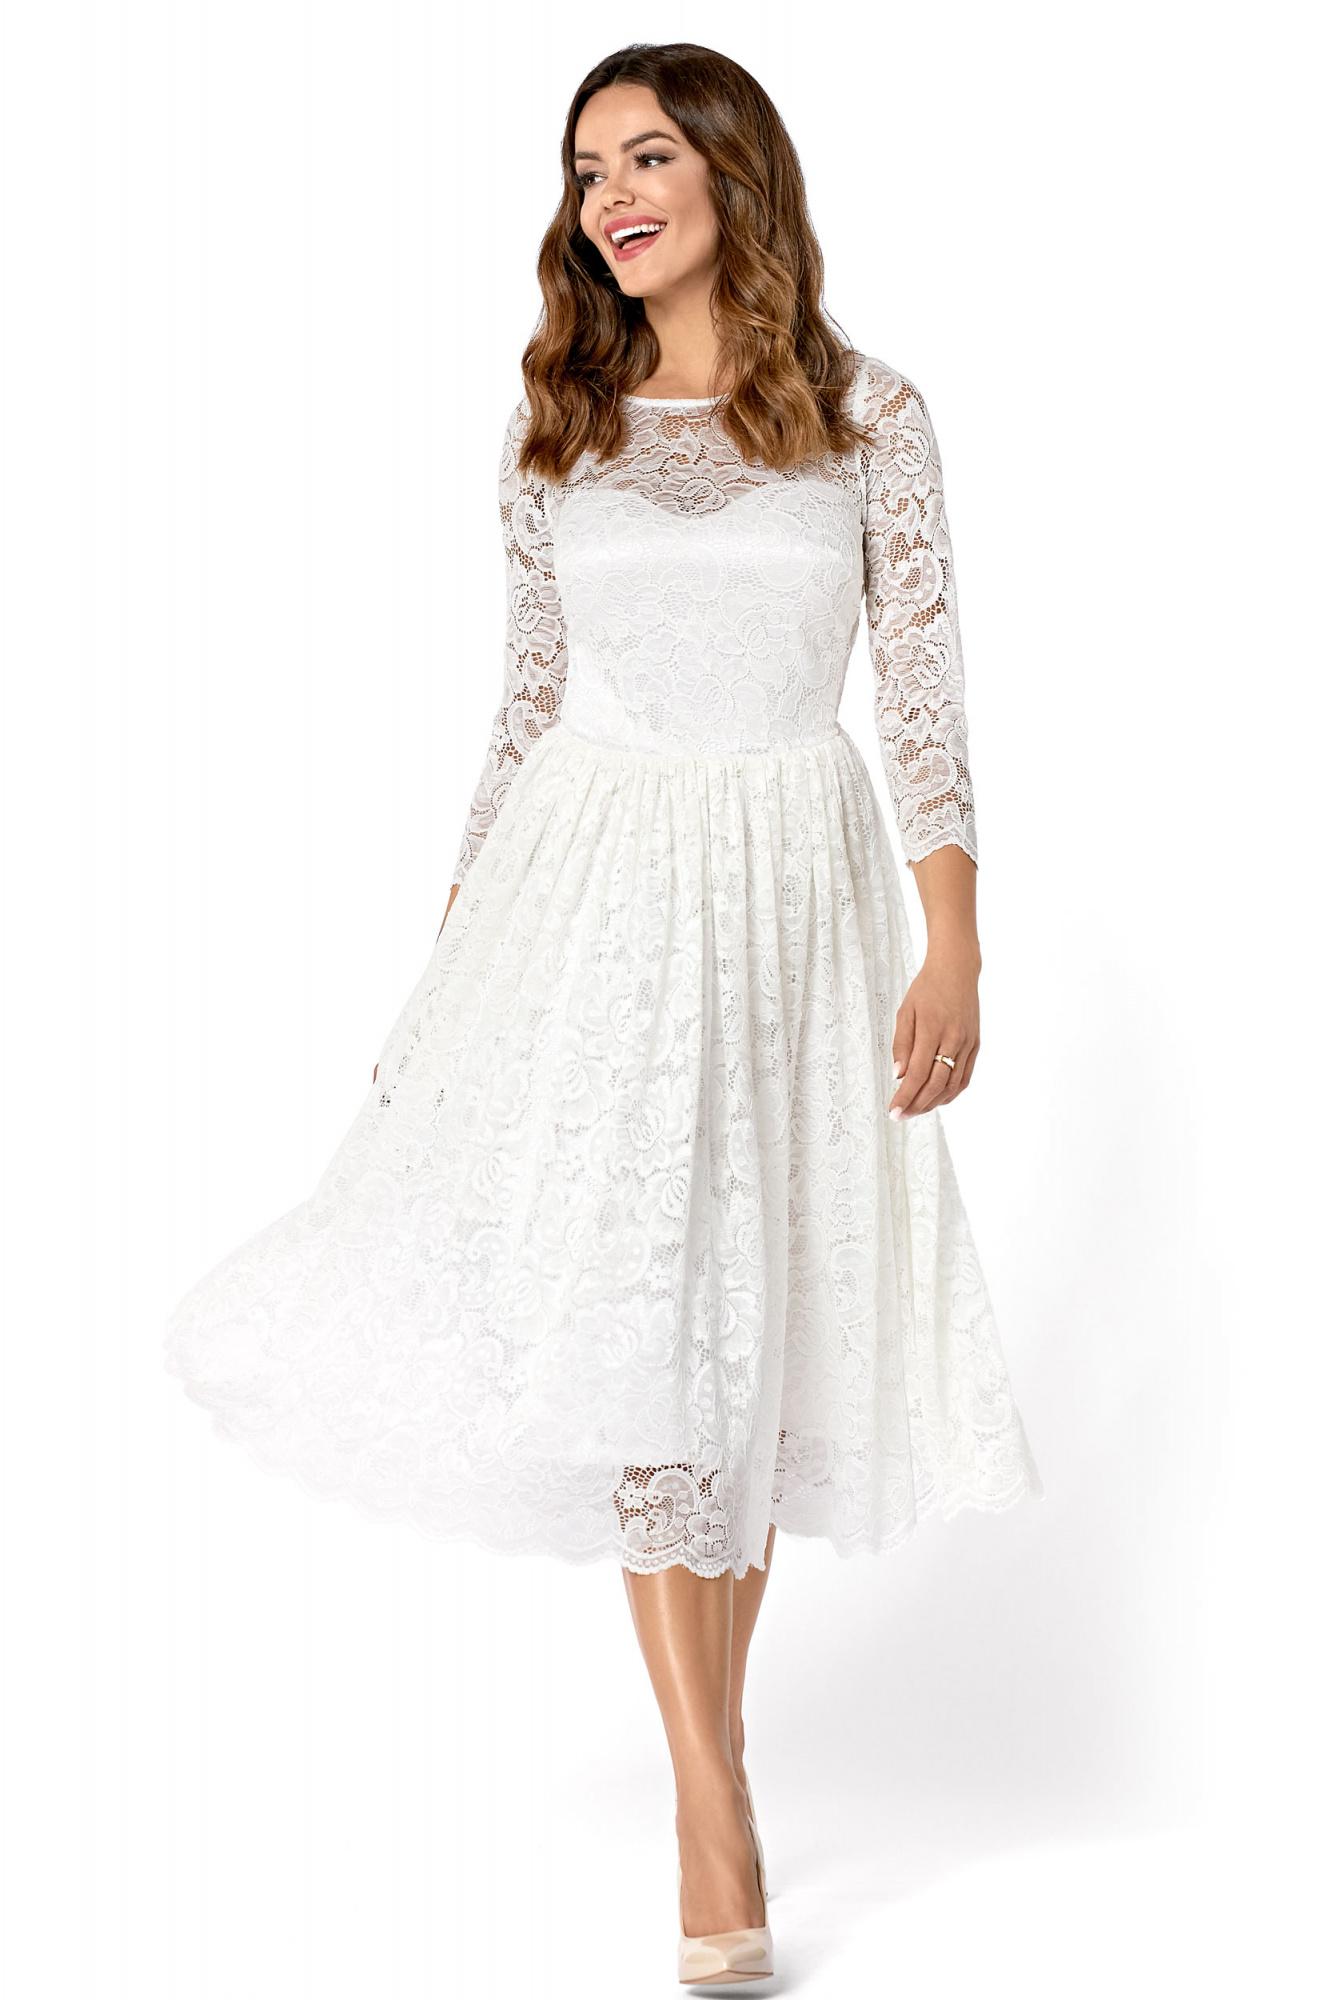 f9fd0c5b10 Carla- Koronkowa sukienka midi KM302-4 - ❤ Kartes-Moda ❤